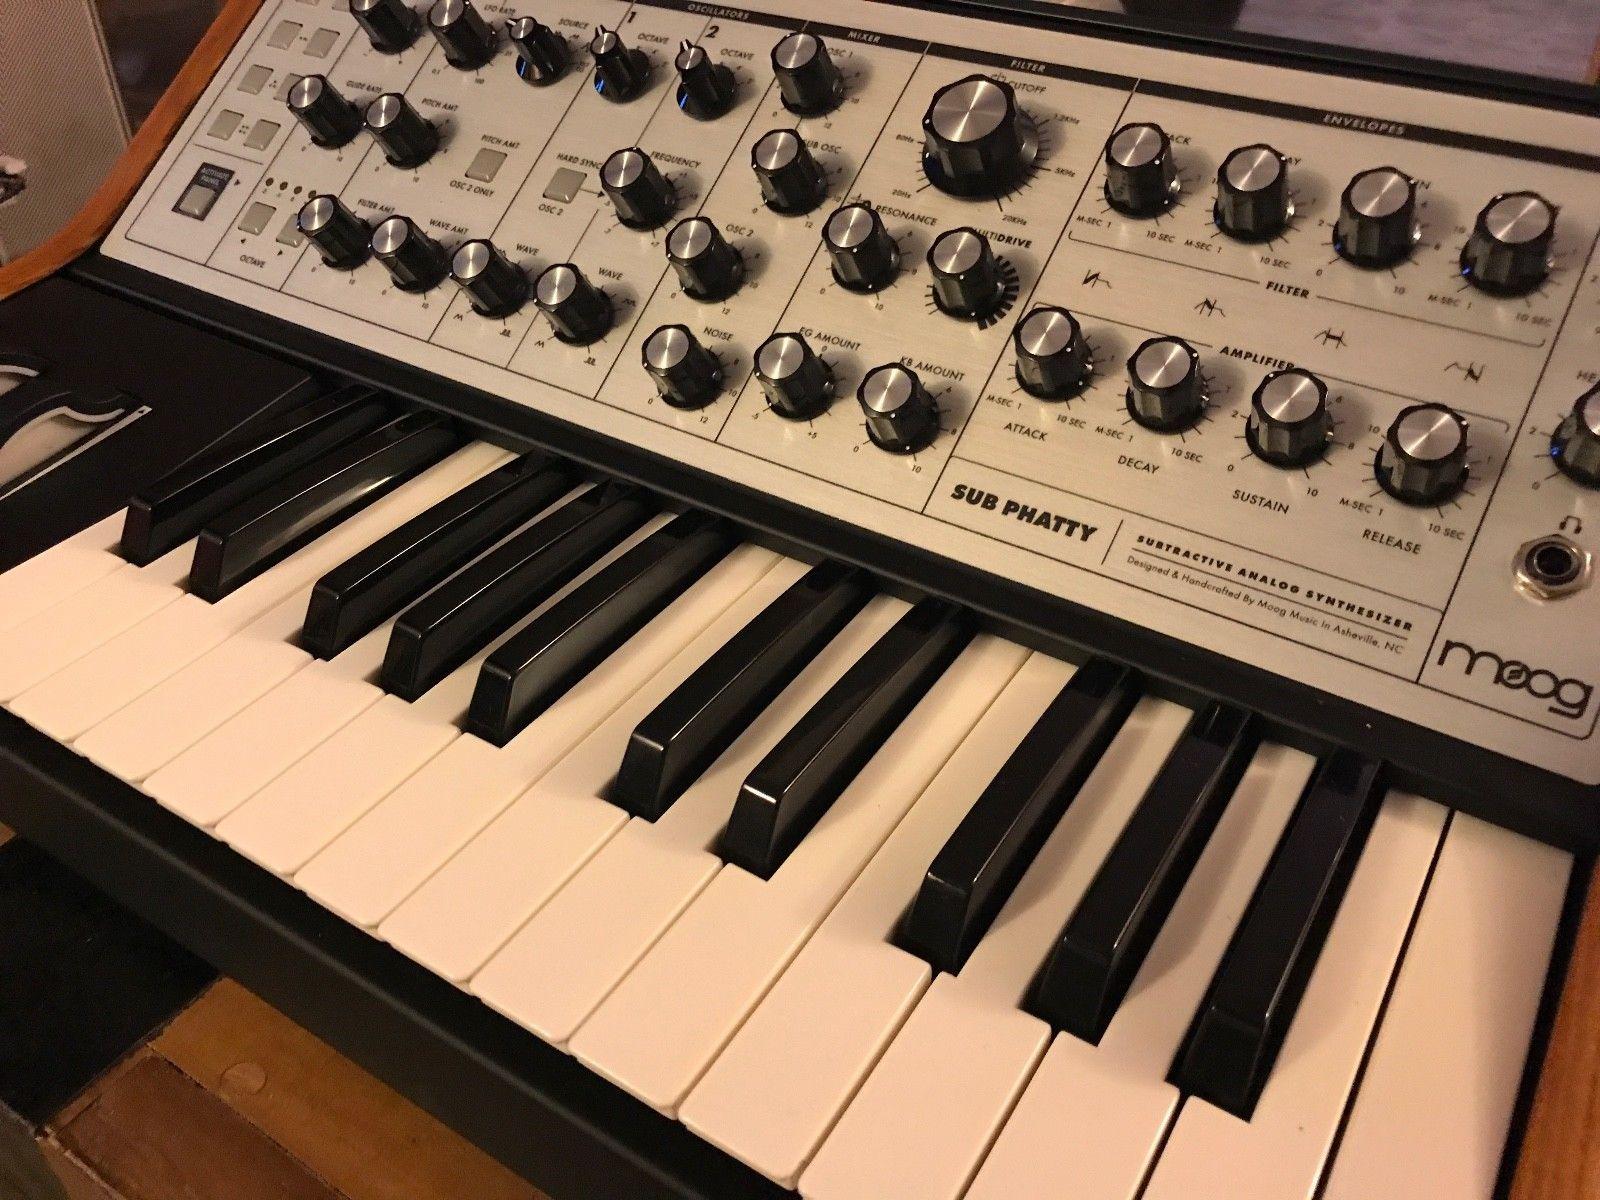 MATRIXSYNTH: Moog Sub Phatty Keyboard Synthesizer with Moog